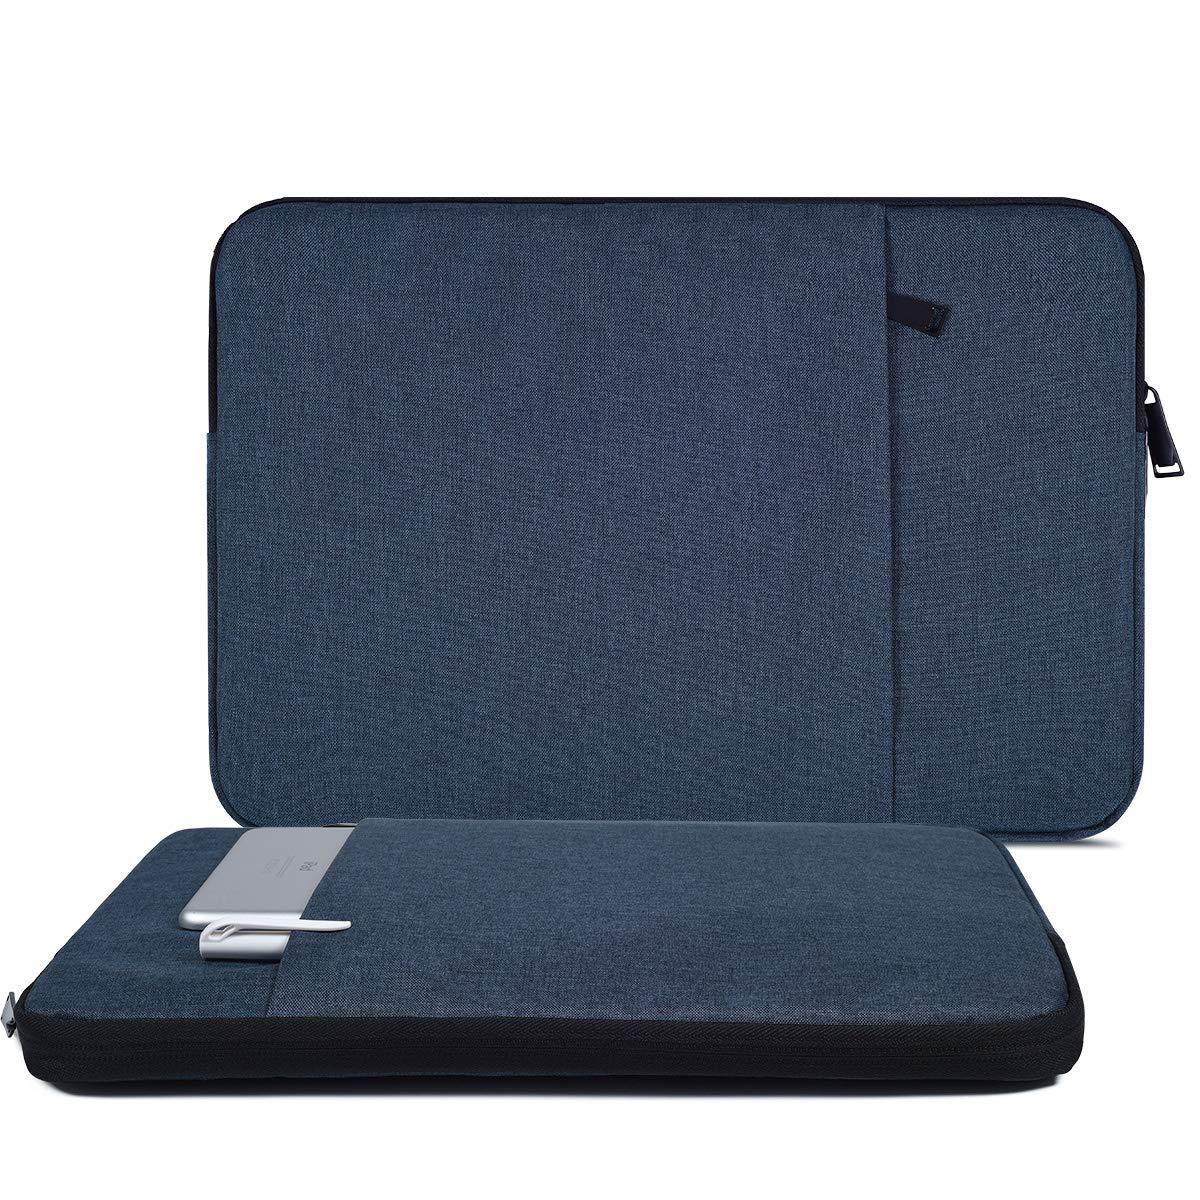 Funda Para Laptop De 15.6 Asus Chromebook/asus Vivobook